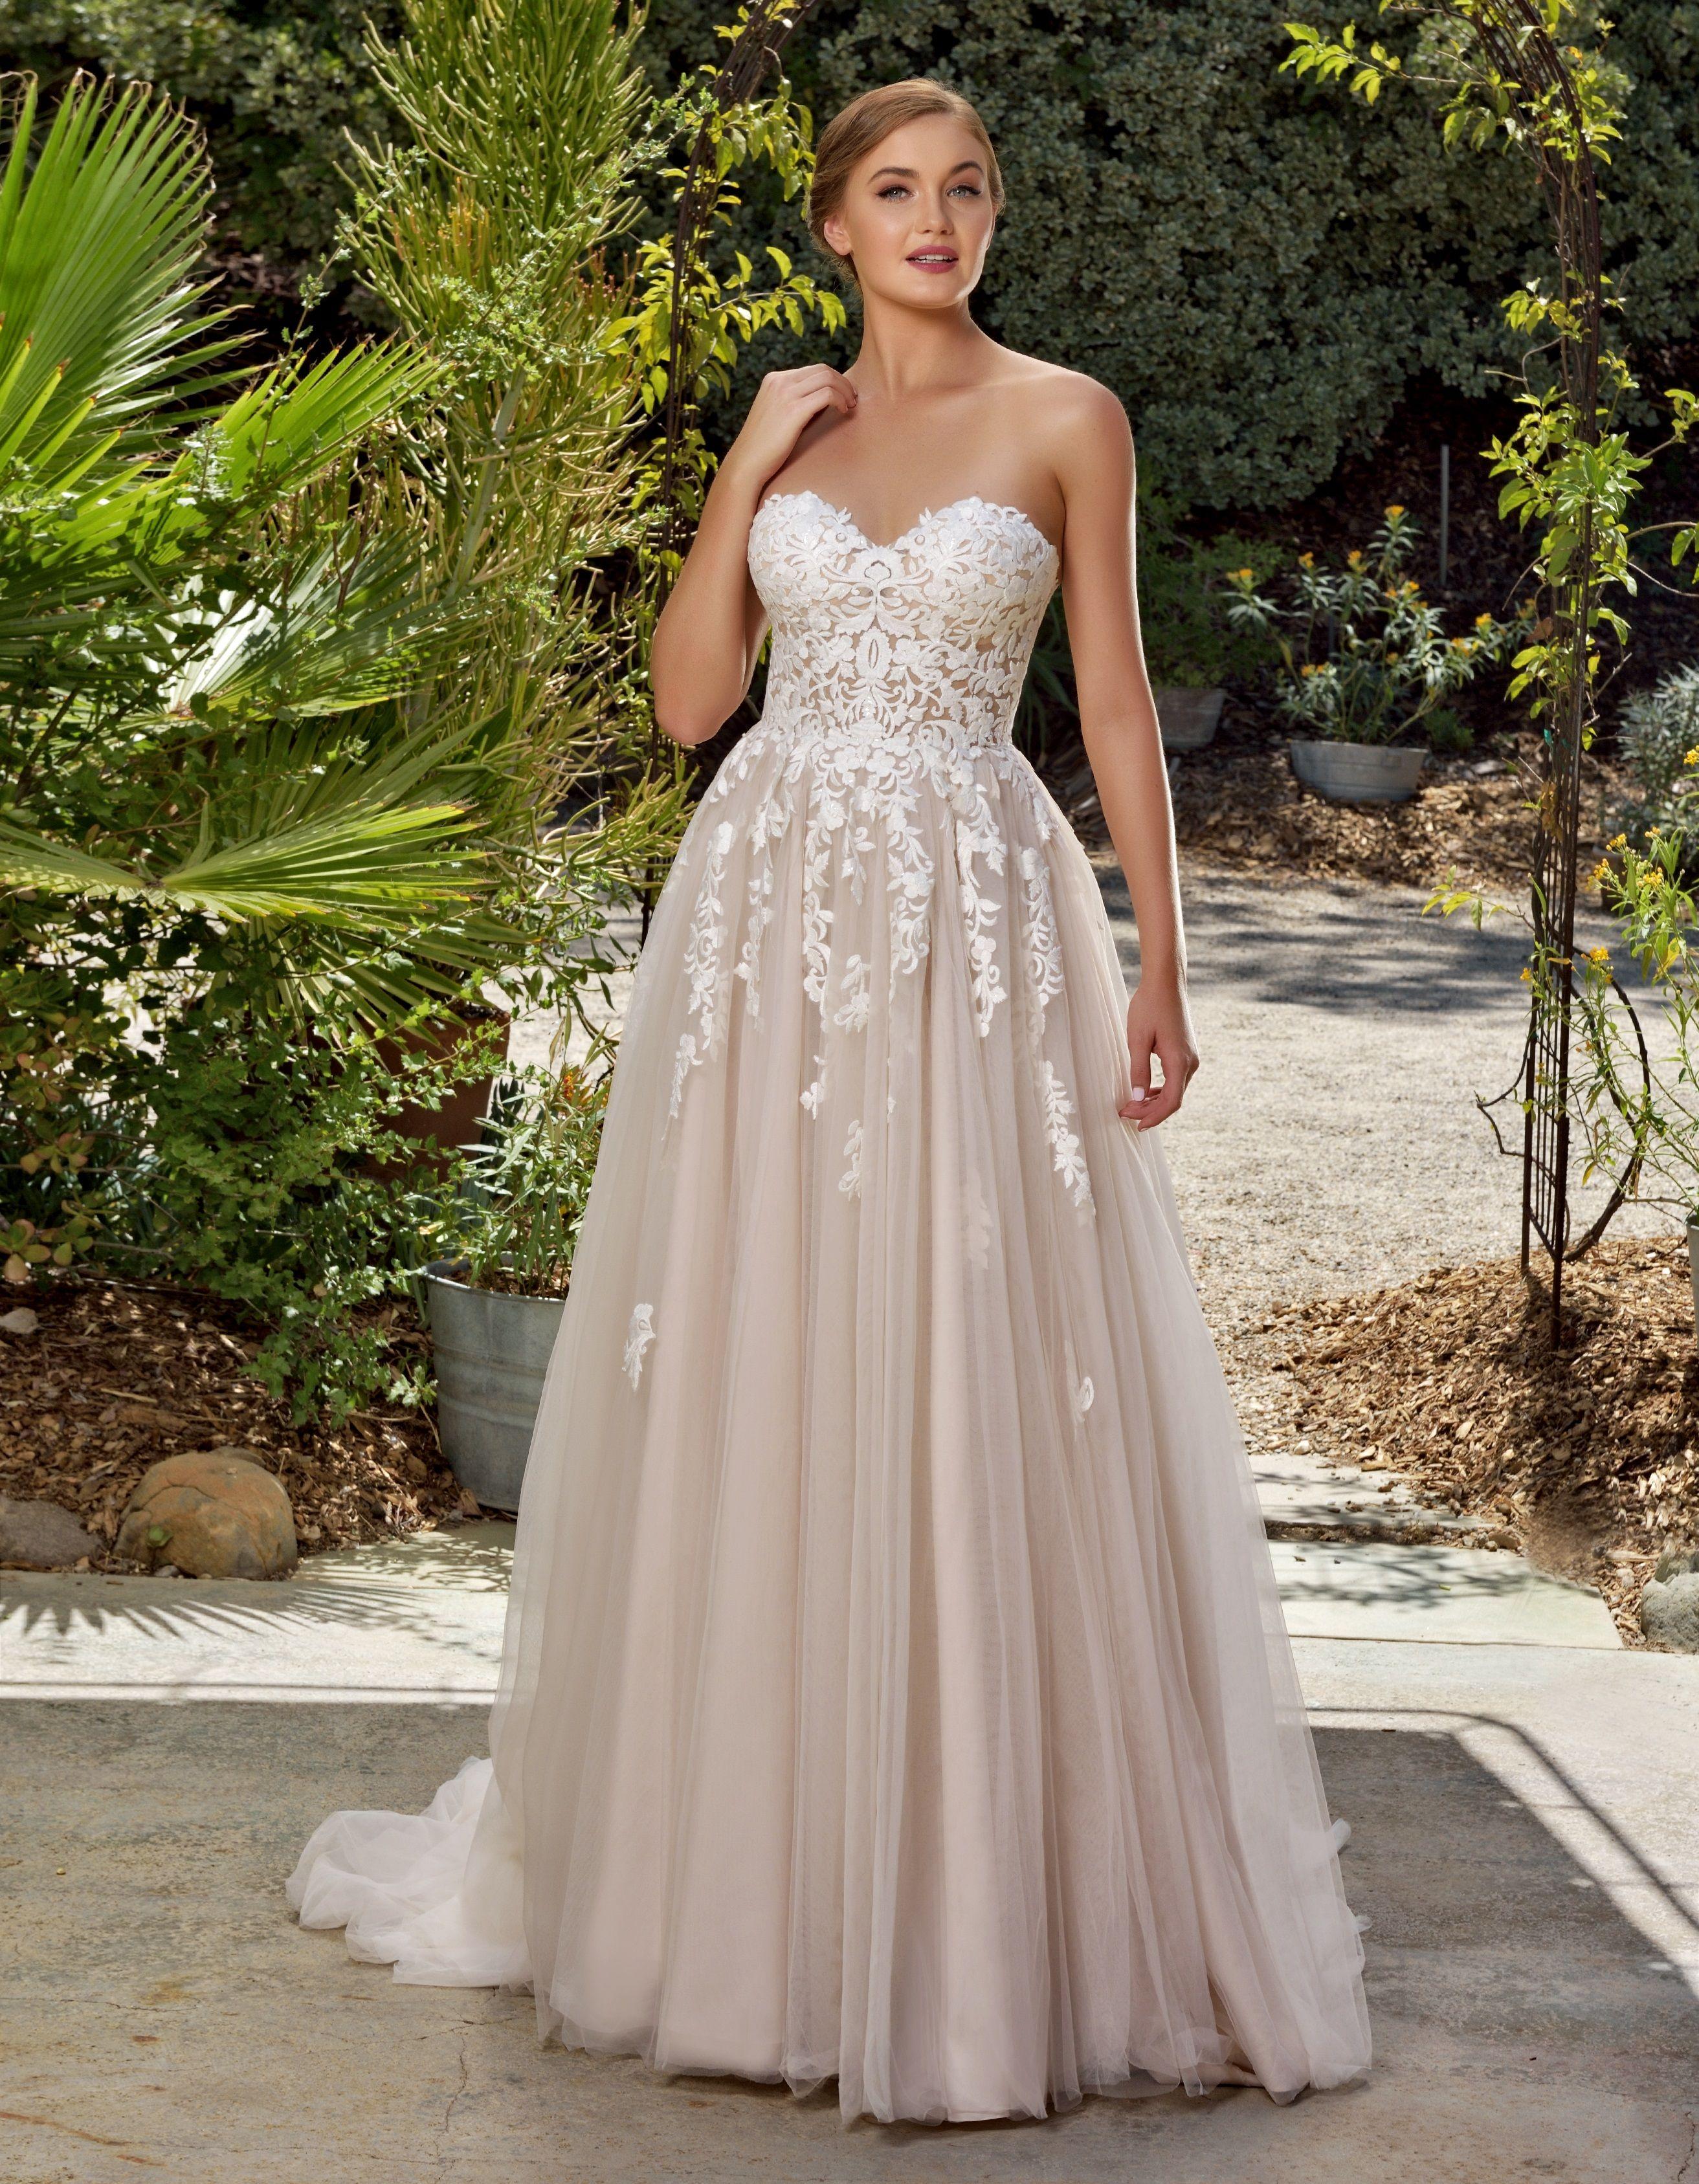 sabrina ann wedding dresses